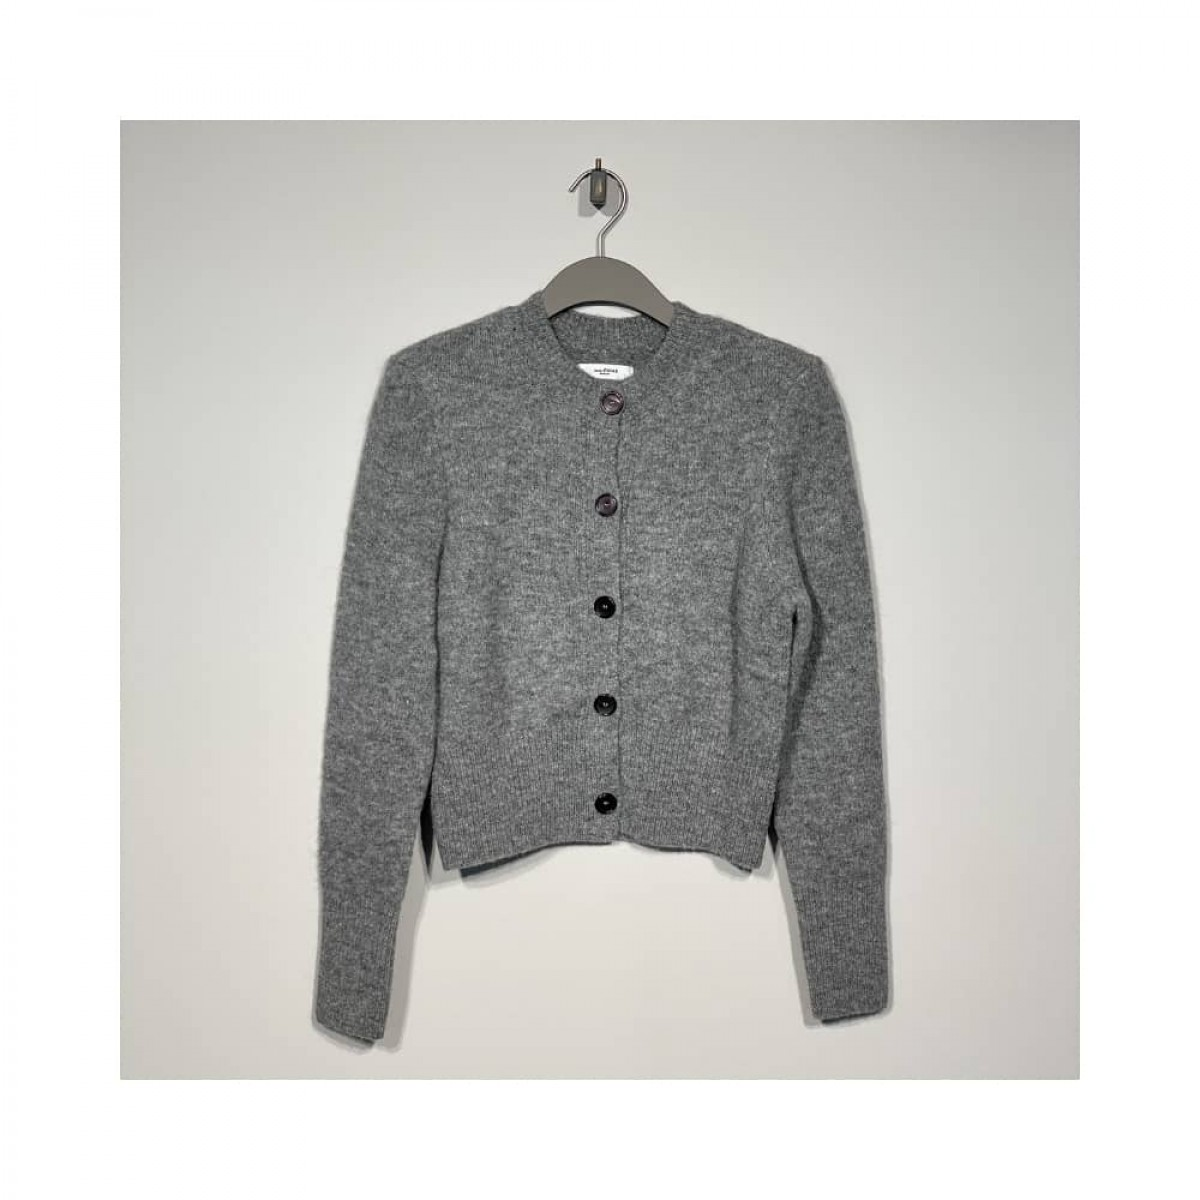 hudson cardigan - grey - front